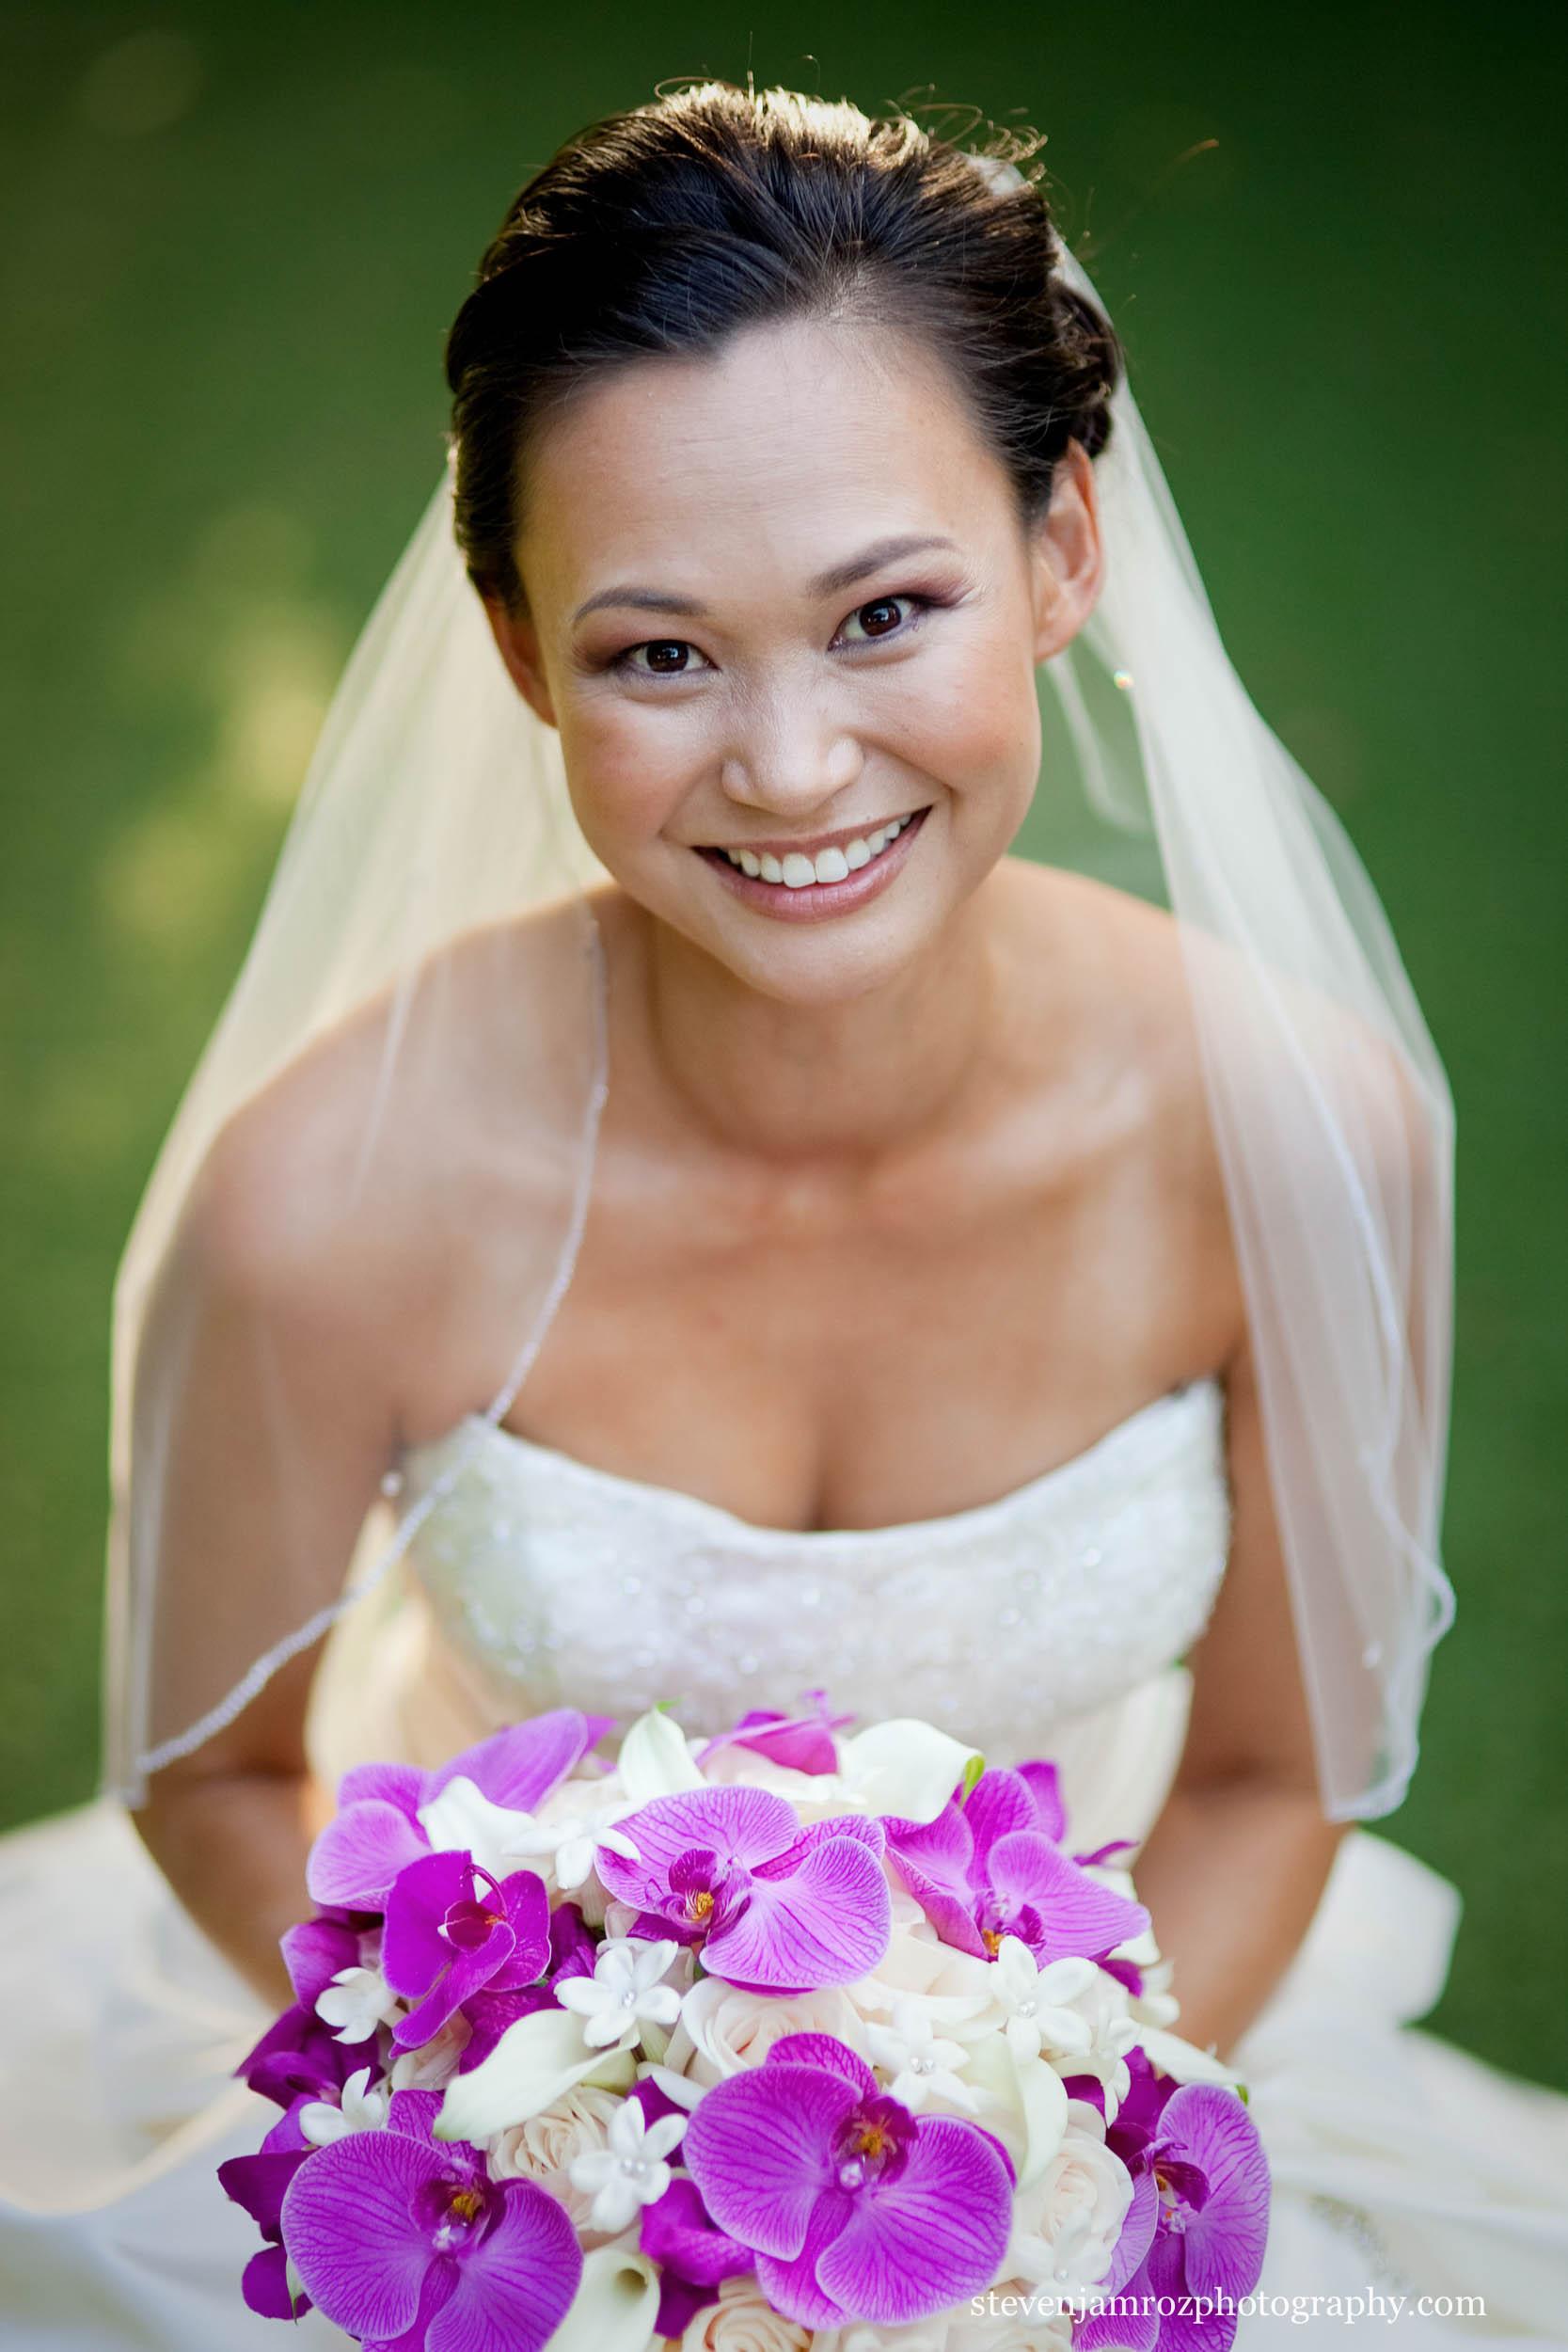 gorgeous-bridal-portrait-chapel-hill-steven-jamroz-photography-0526.jpg